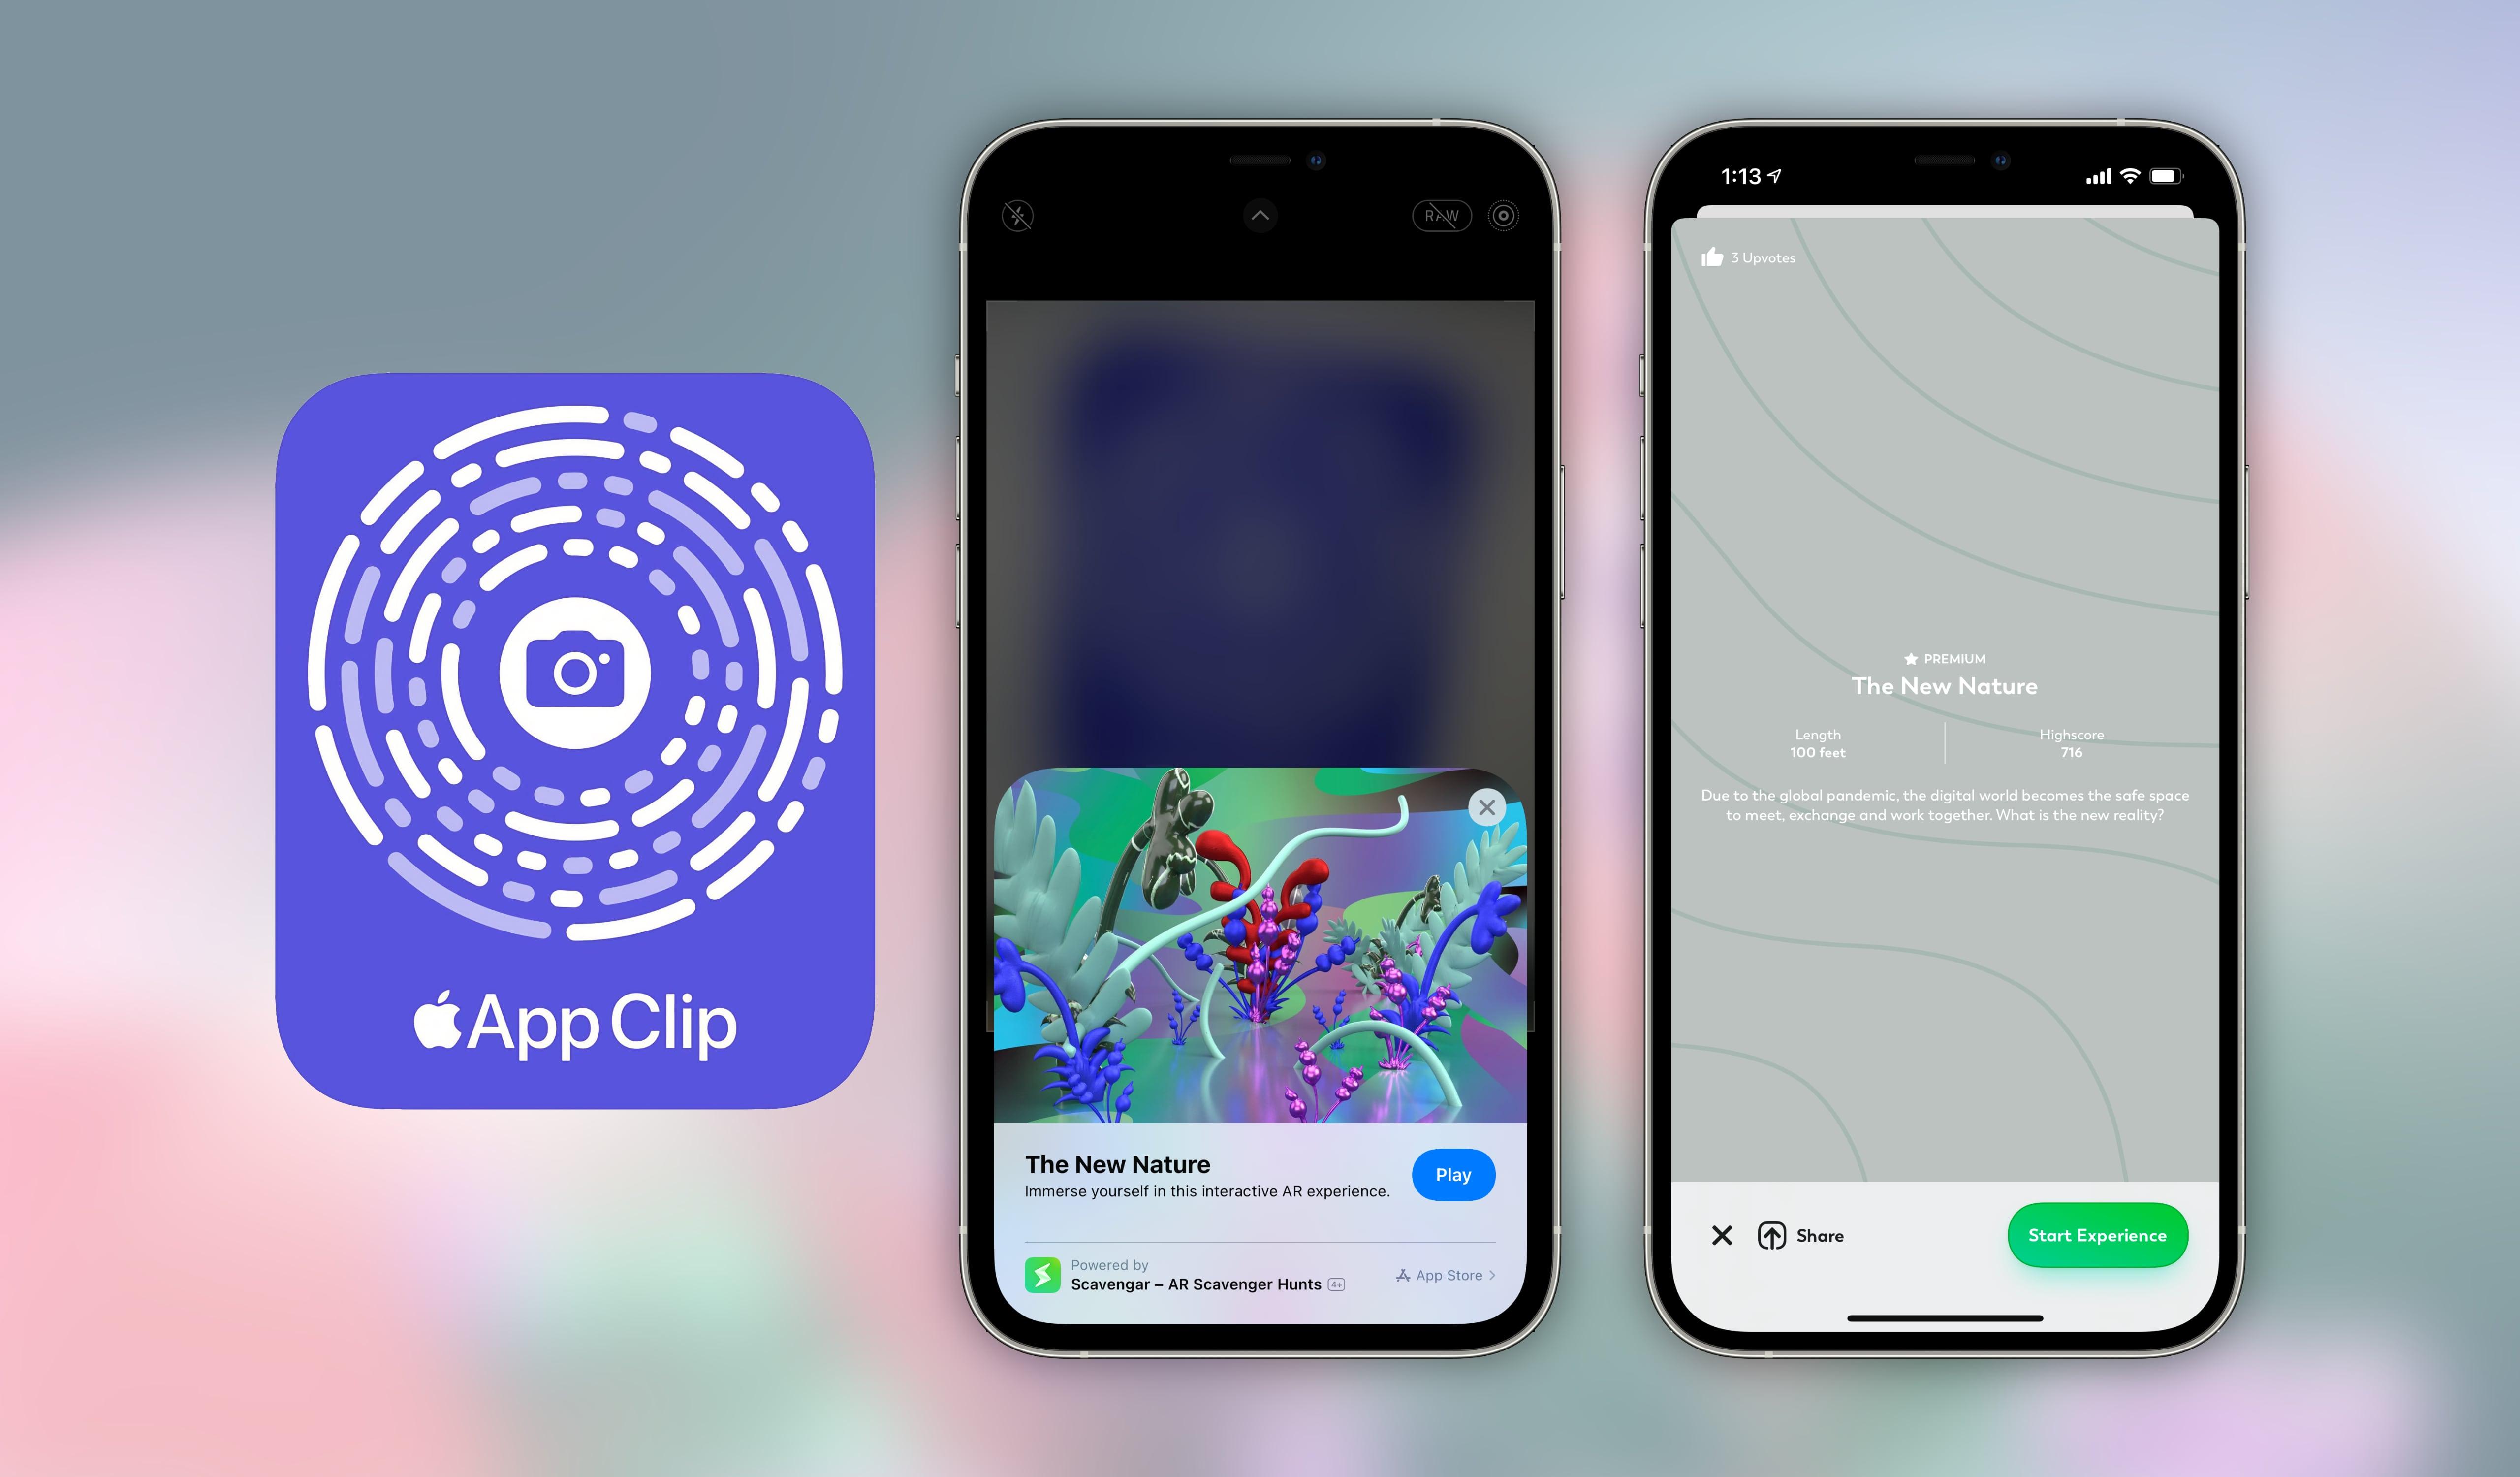 App Clip Code